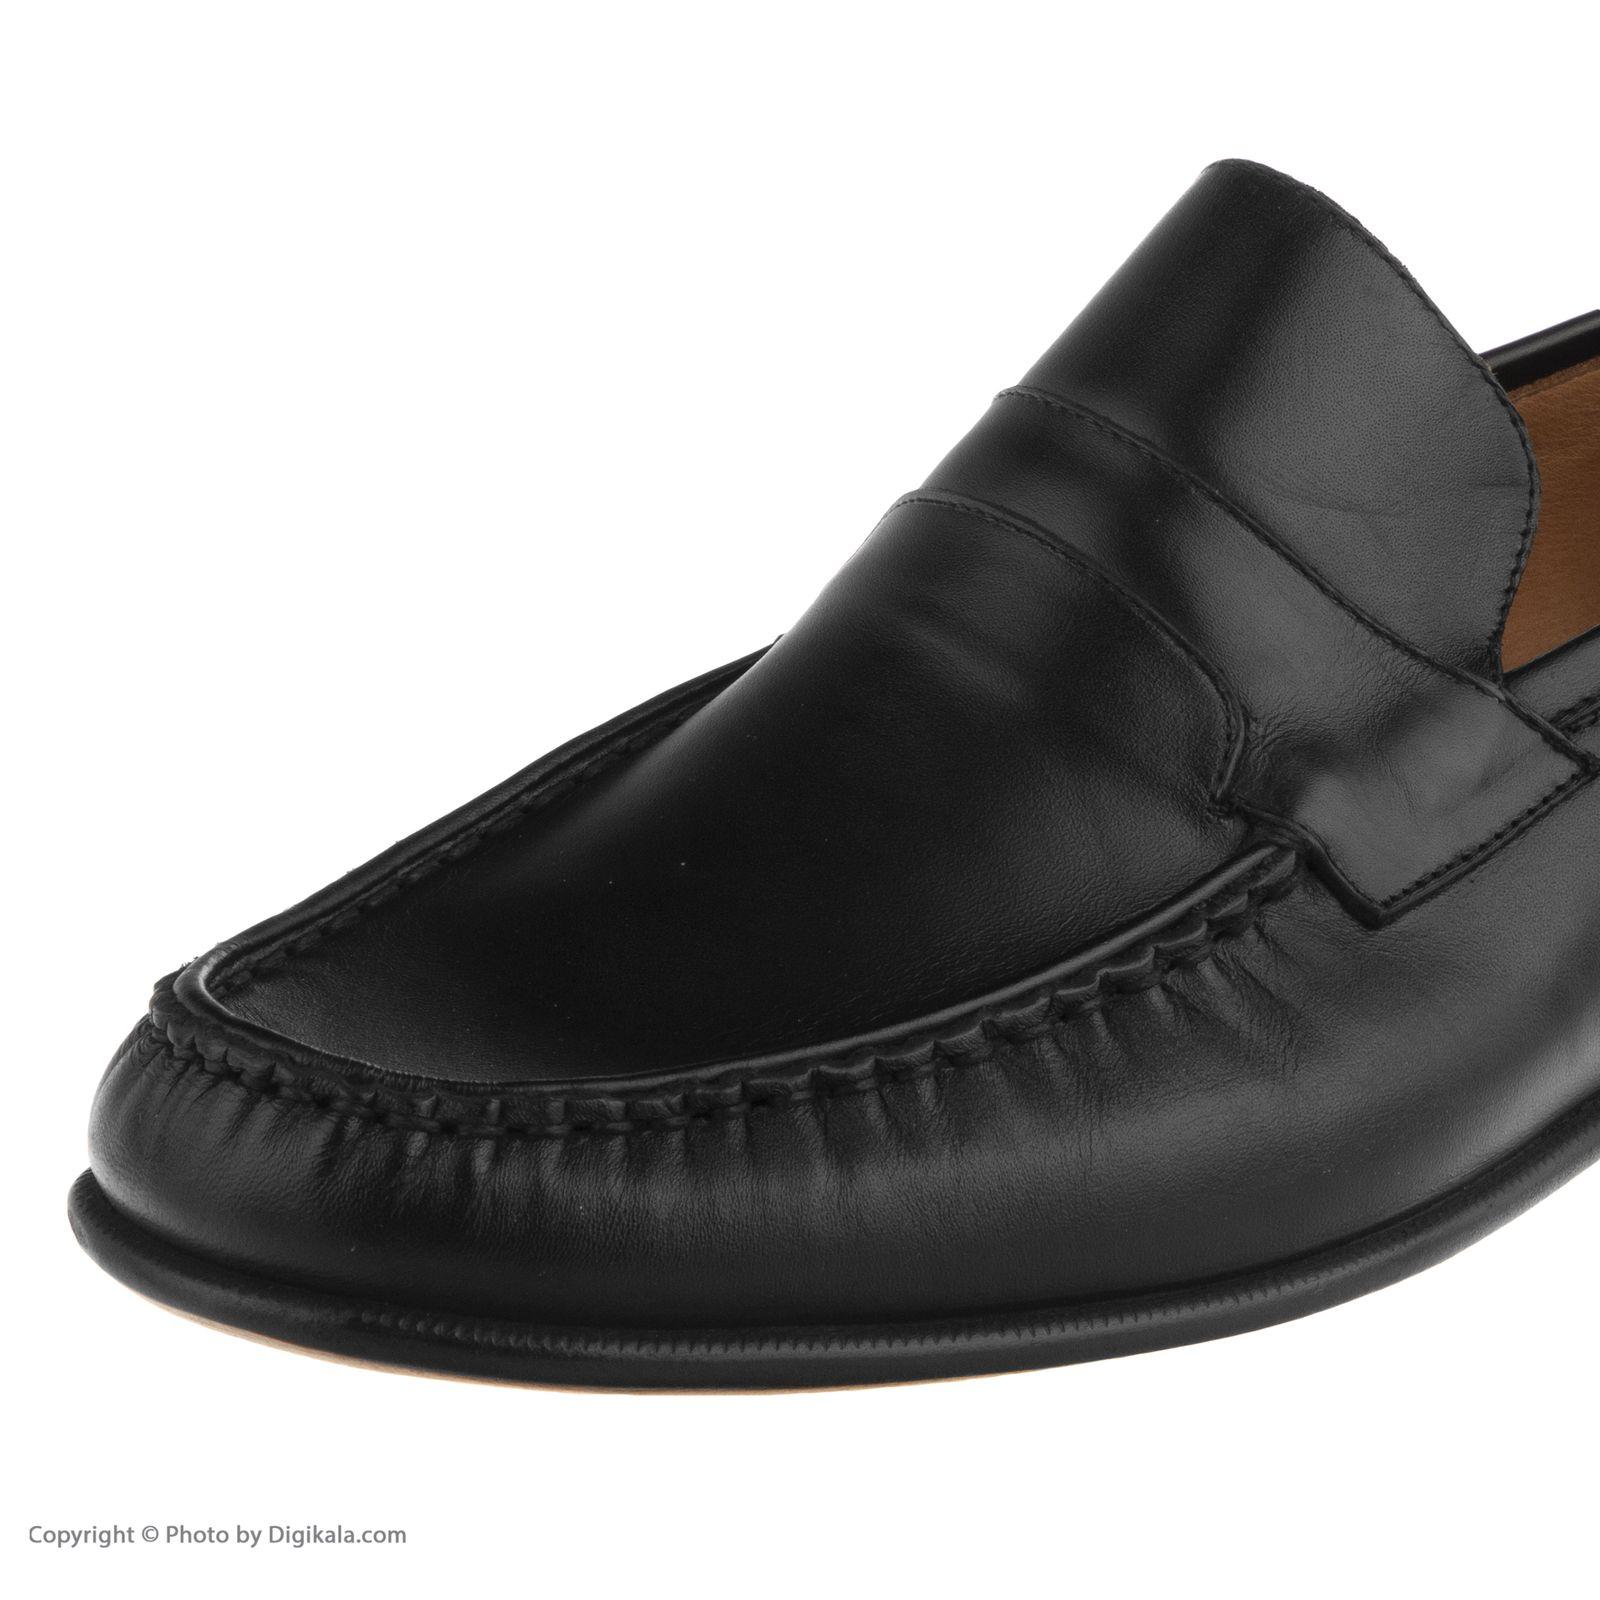 کفش مردانه نظری کد 409 -  - 6